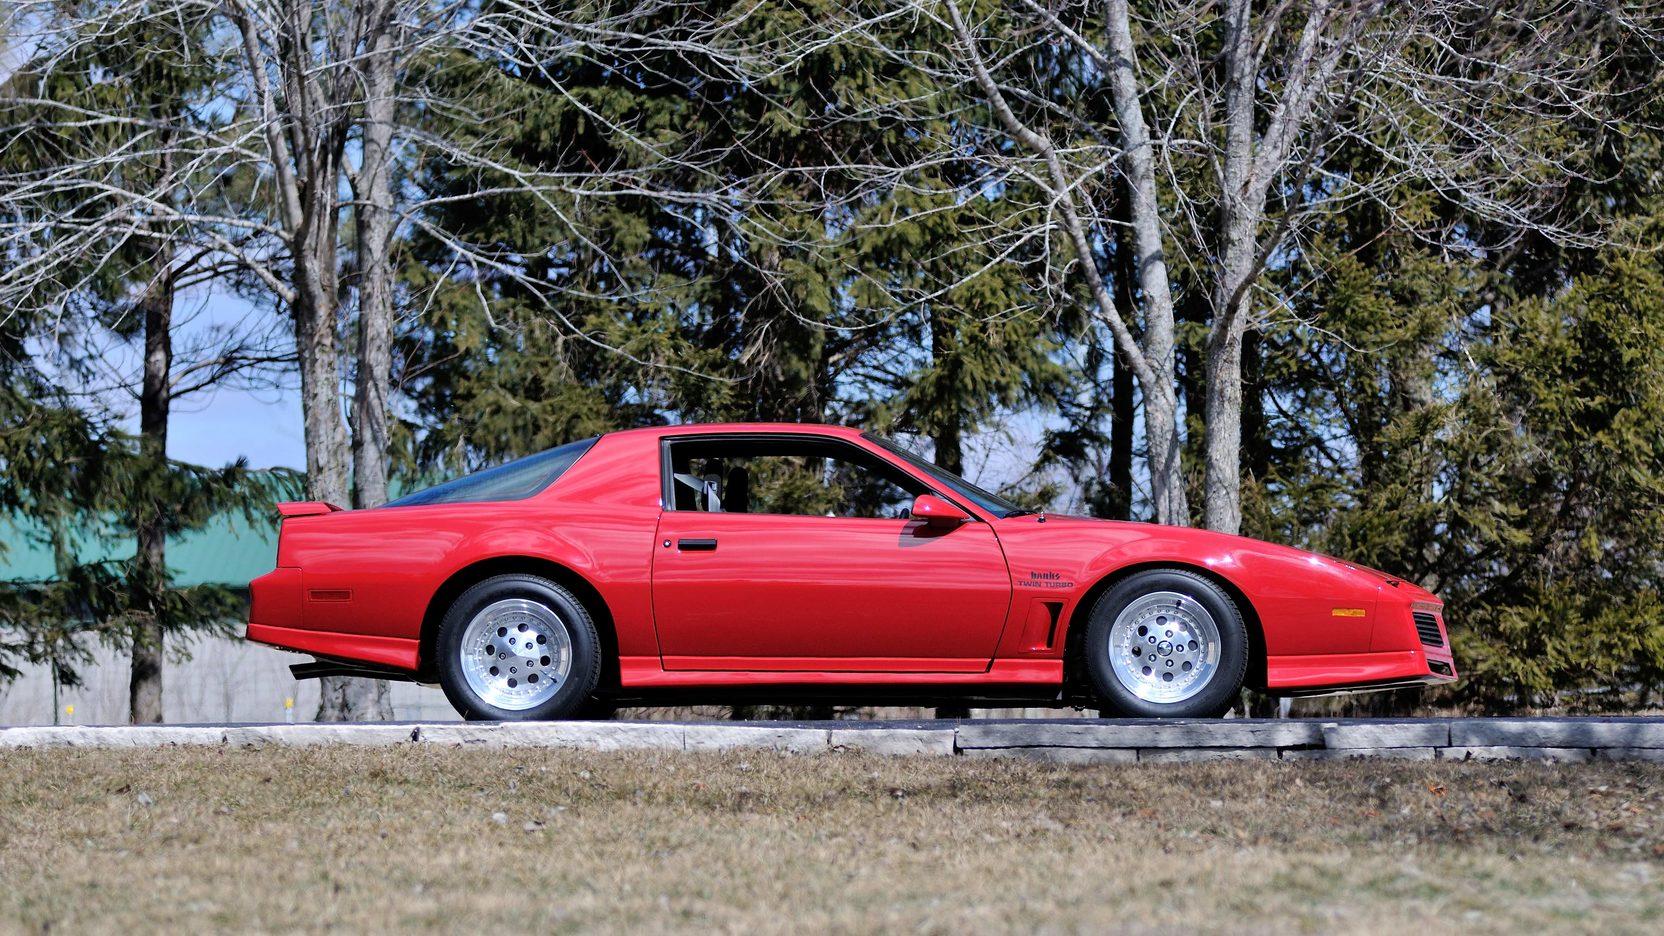 1982 Pontiac Trans Am profile